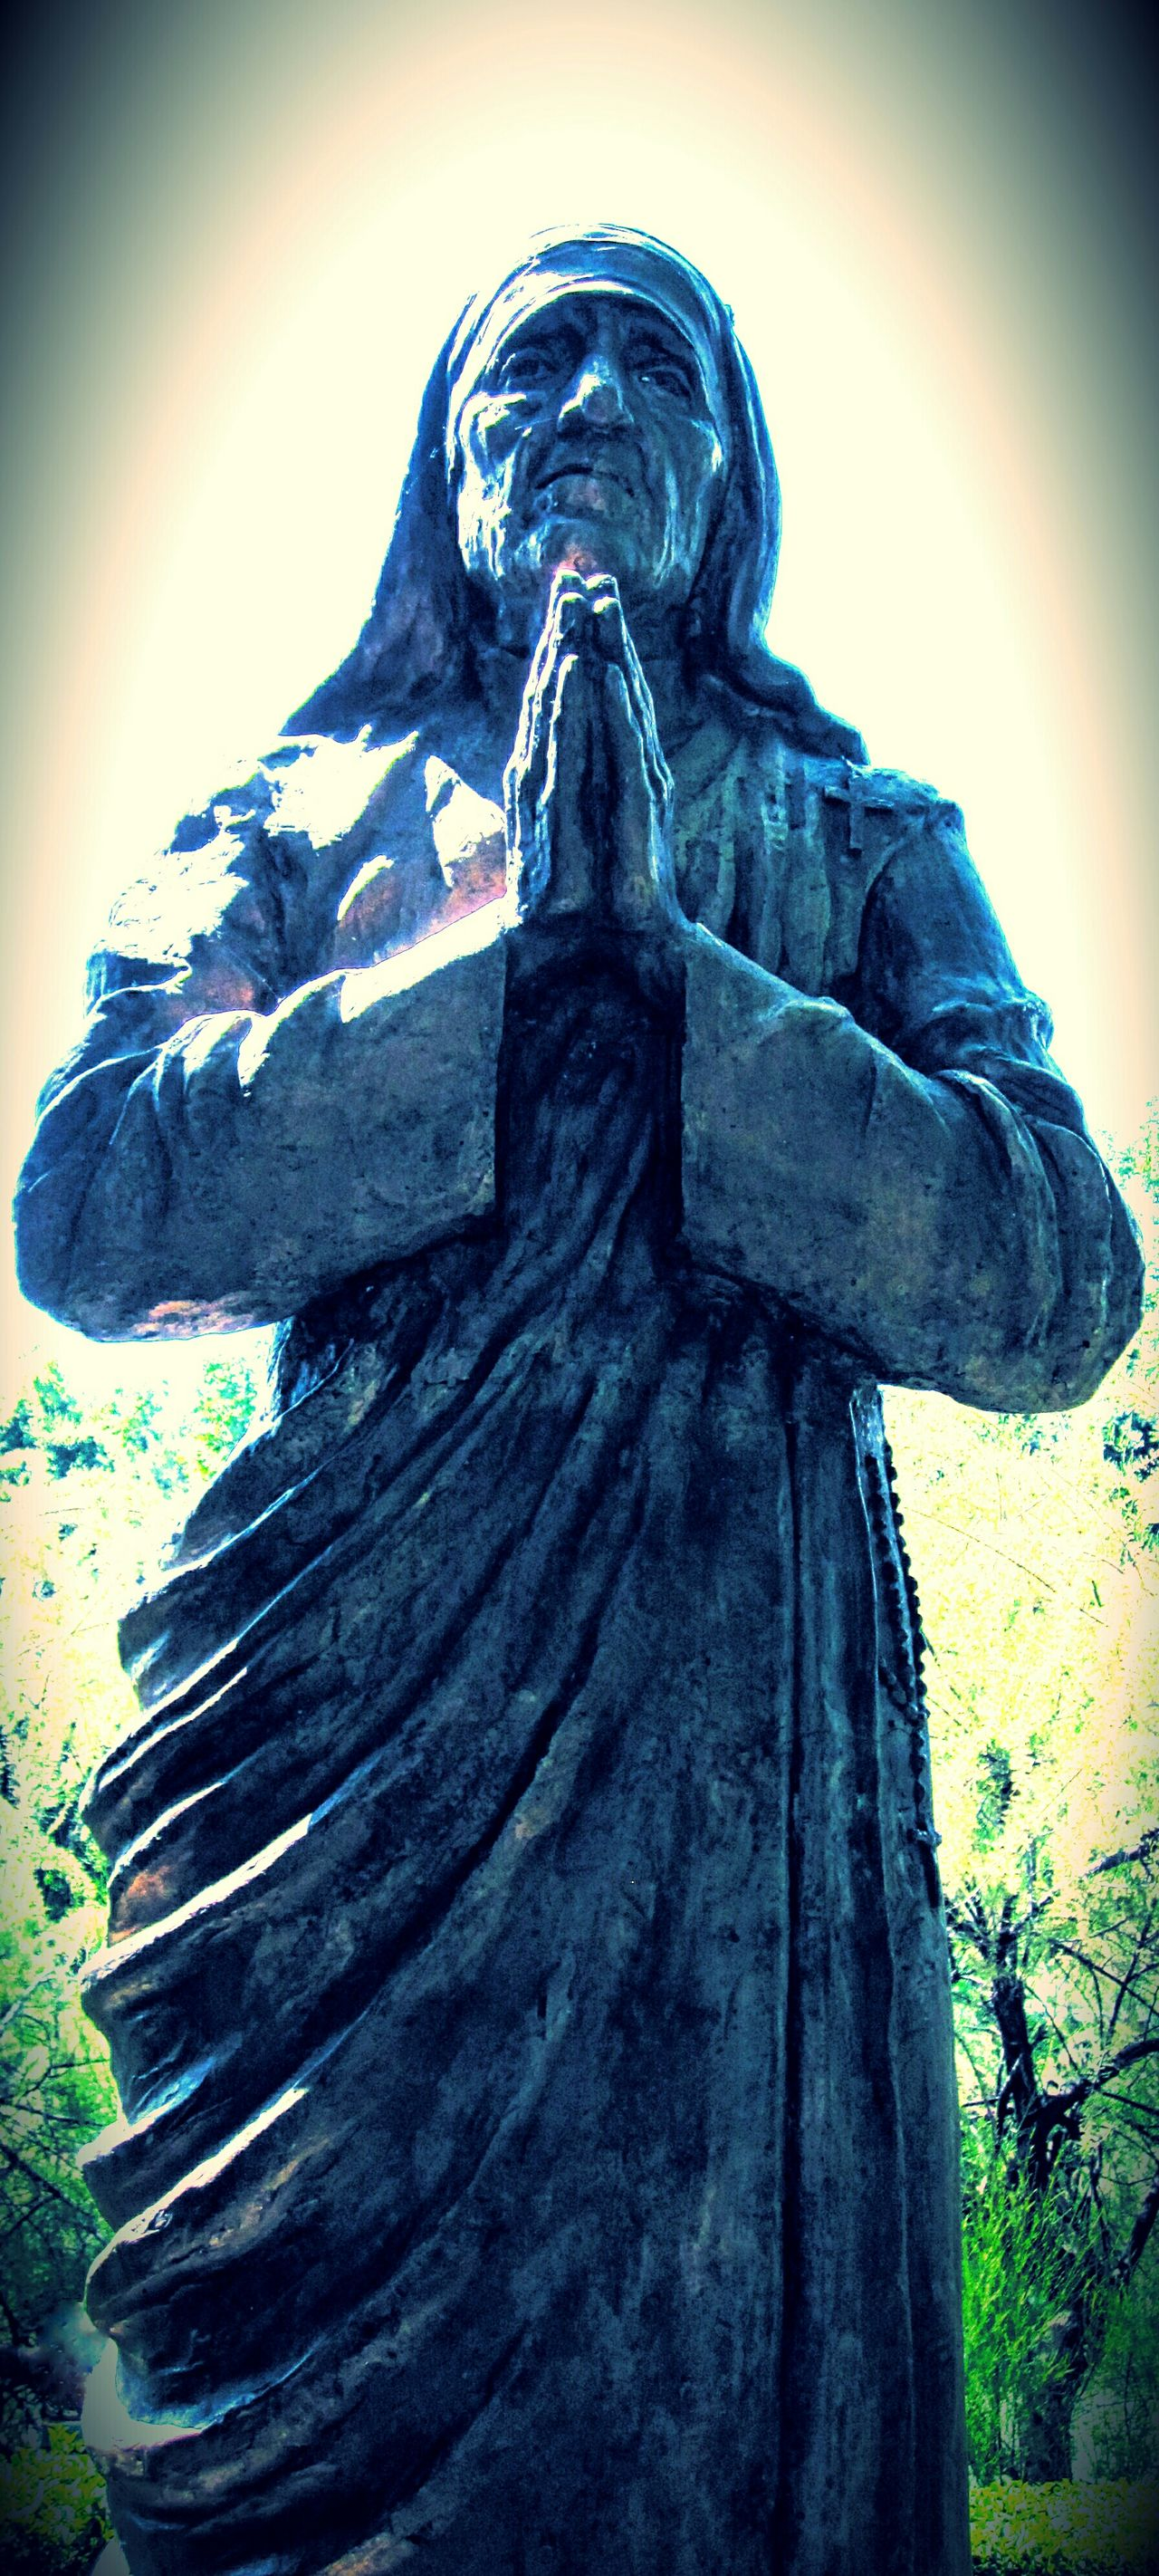 Mother Teresa. Eye For Photography From My Point Of View Eyeem Capturing My Moments EyeEm Best Edits Eyem Best Shot - My World Love To Take Photos ❤ The Moment - 2015 EyeEm Awards Eyeem Popular Photos EyeEm Best Shots Made By Me Peje Kosova Kosovo Mother Teresa Saint Teresa